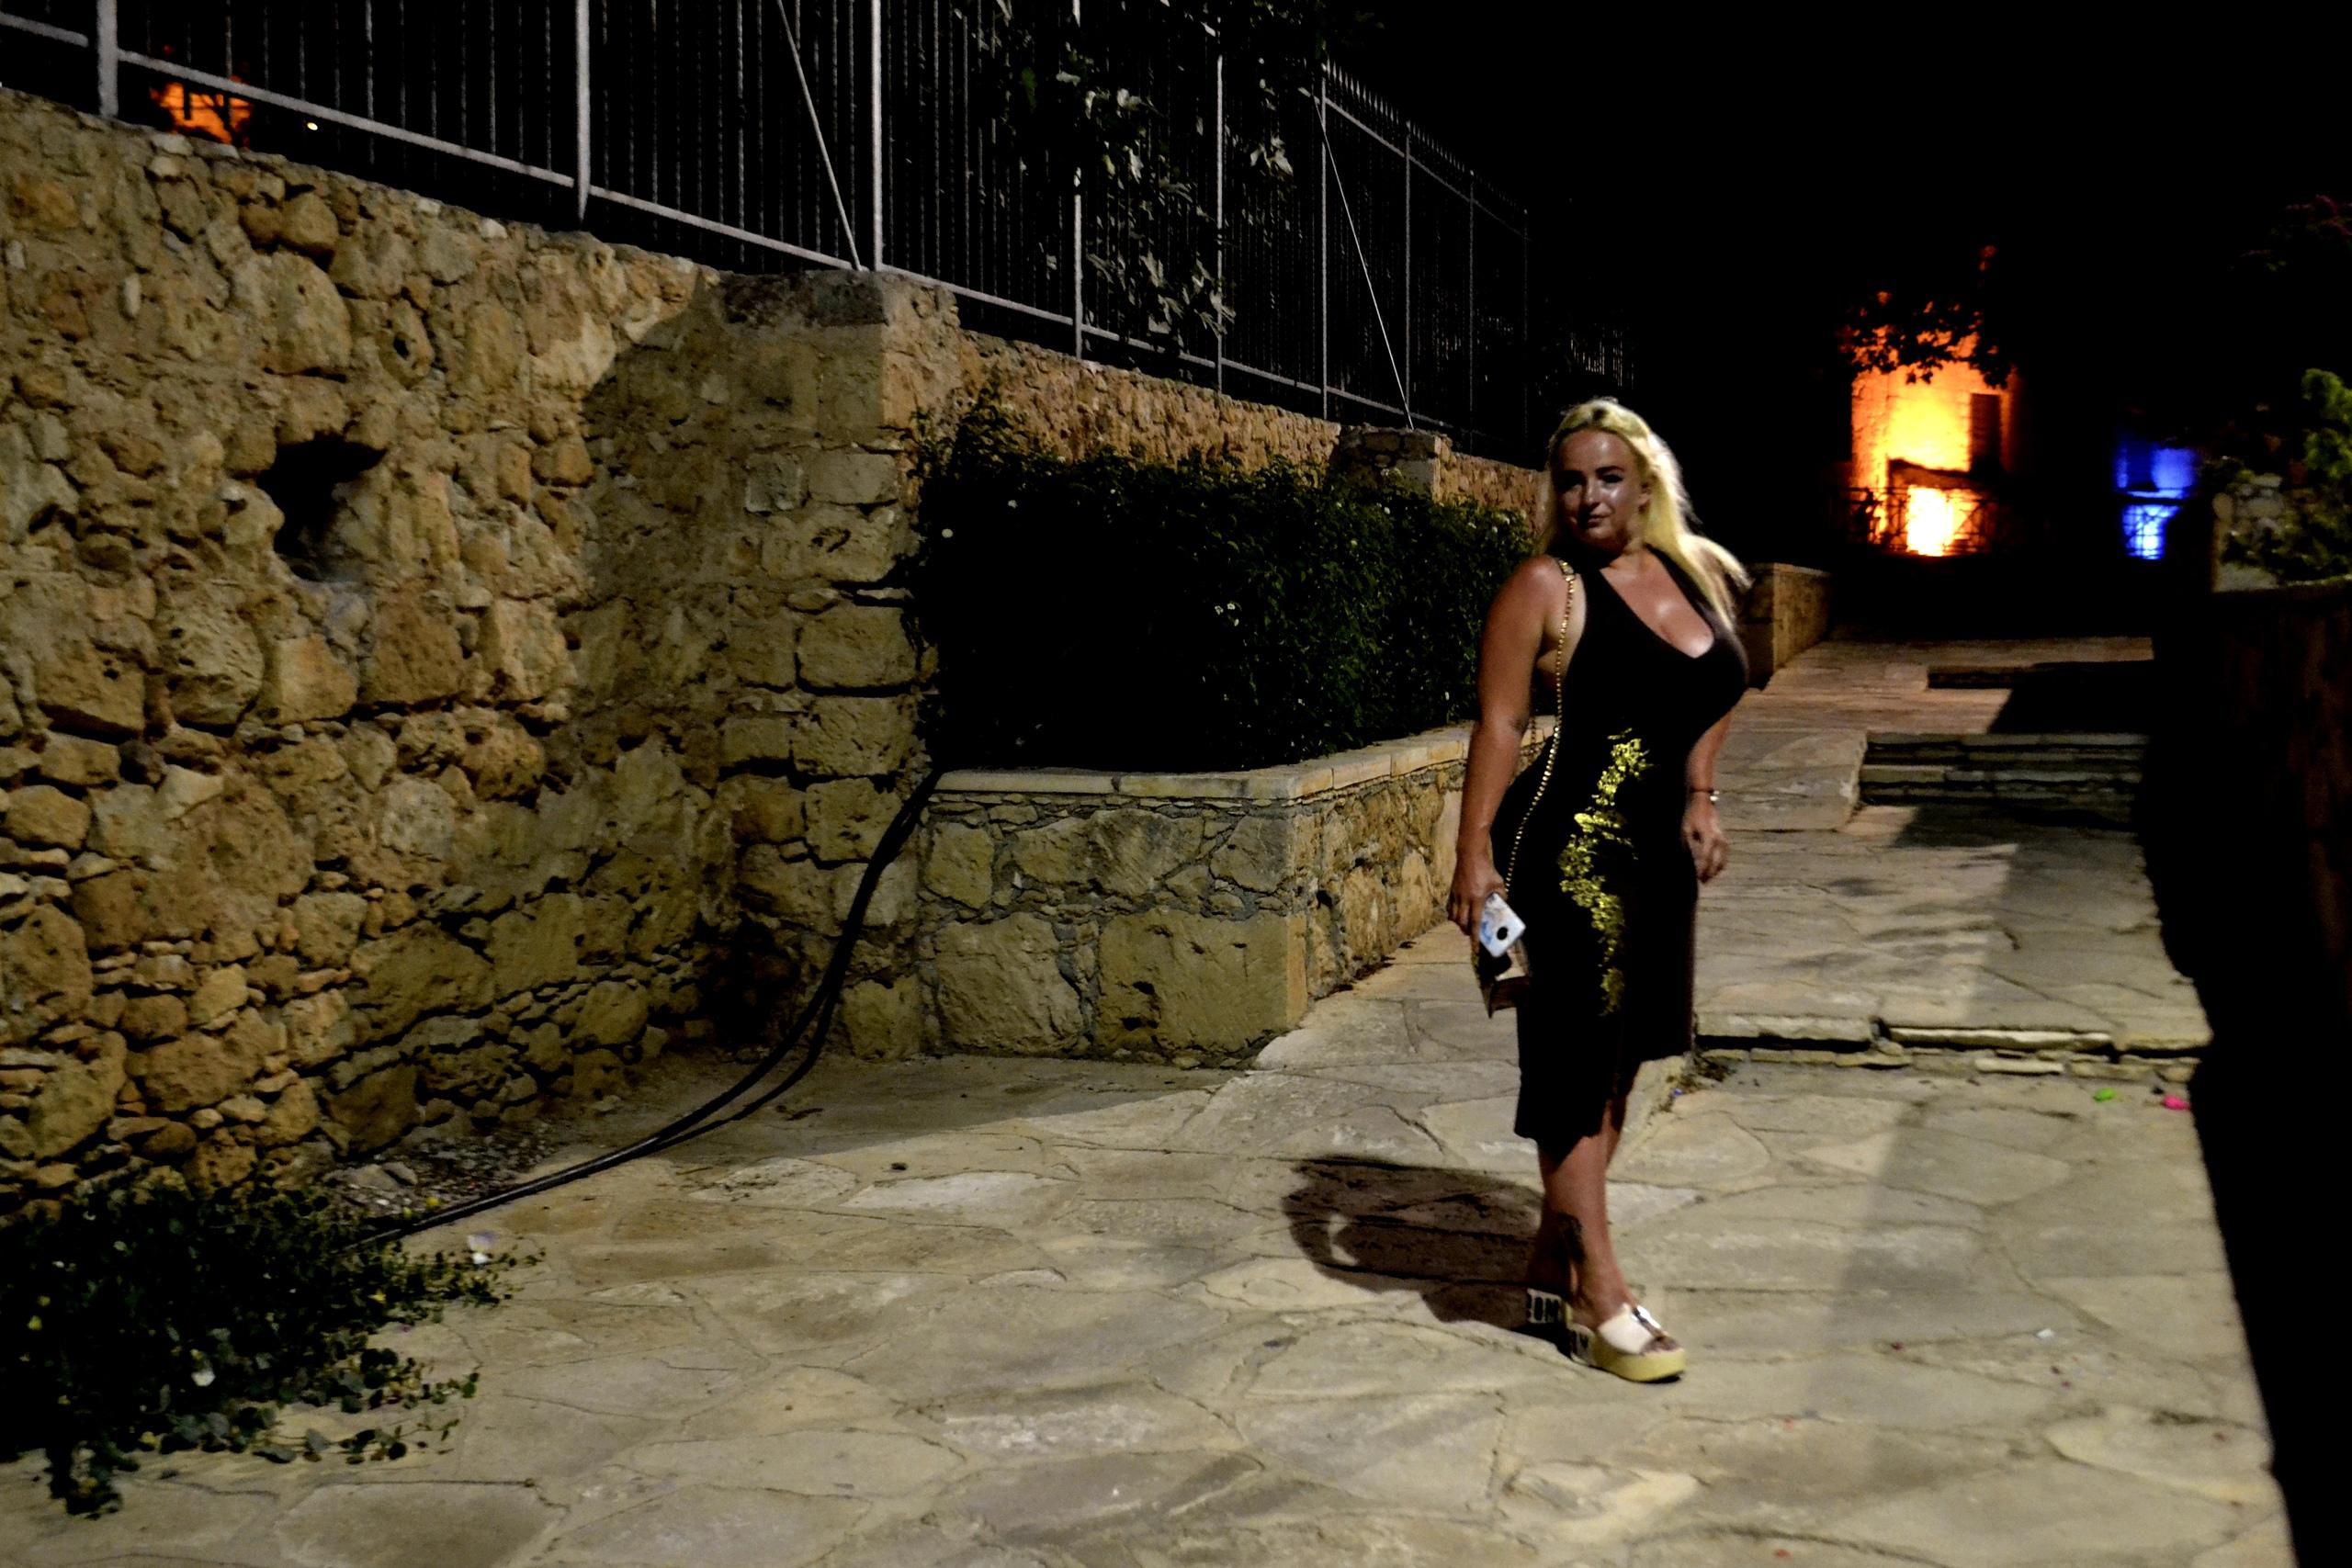 Елена Руденко (Валтея). Кипр. Айия-Напа (фото). - Страница 9 DCW-K6uHDAU